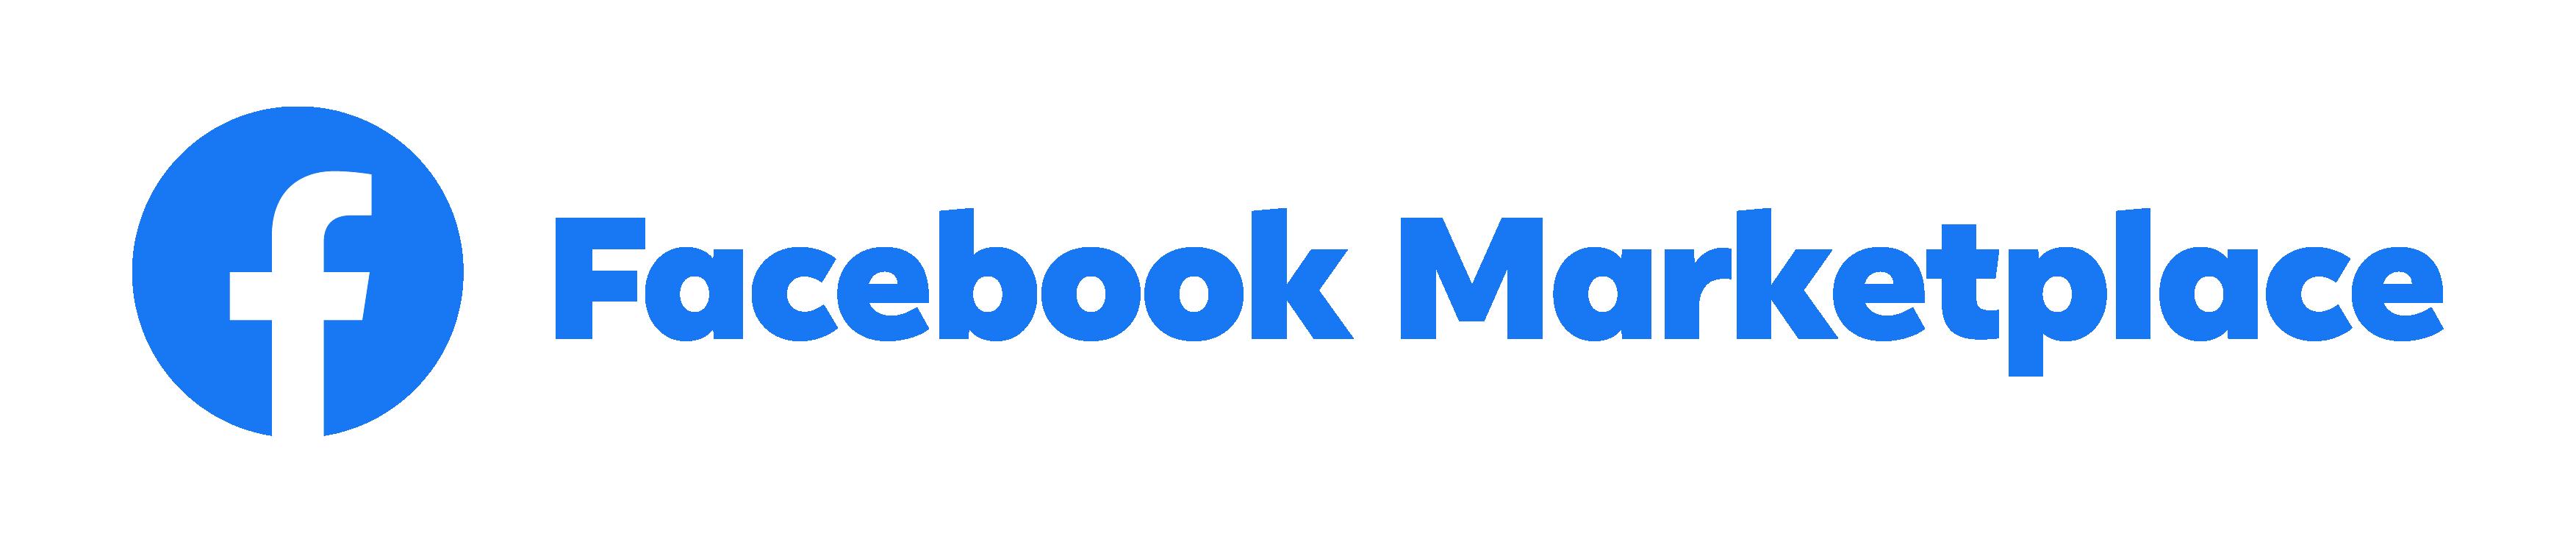 Facebook Marketplace Logo